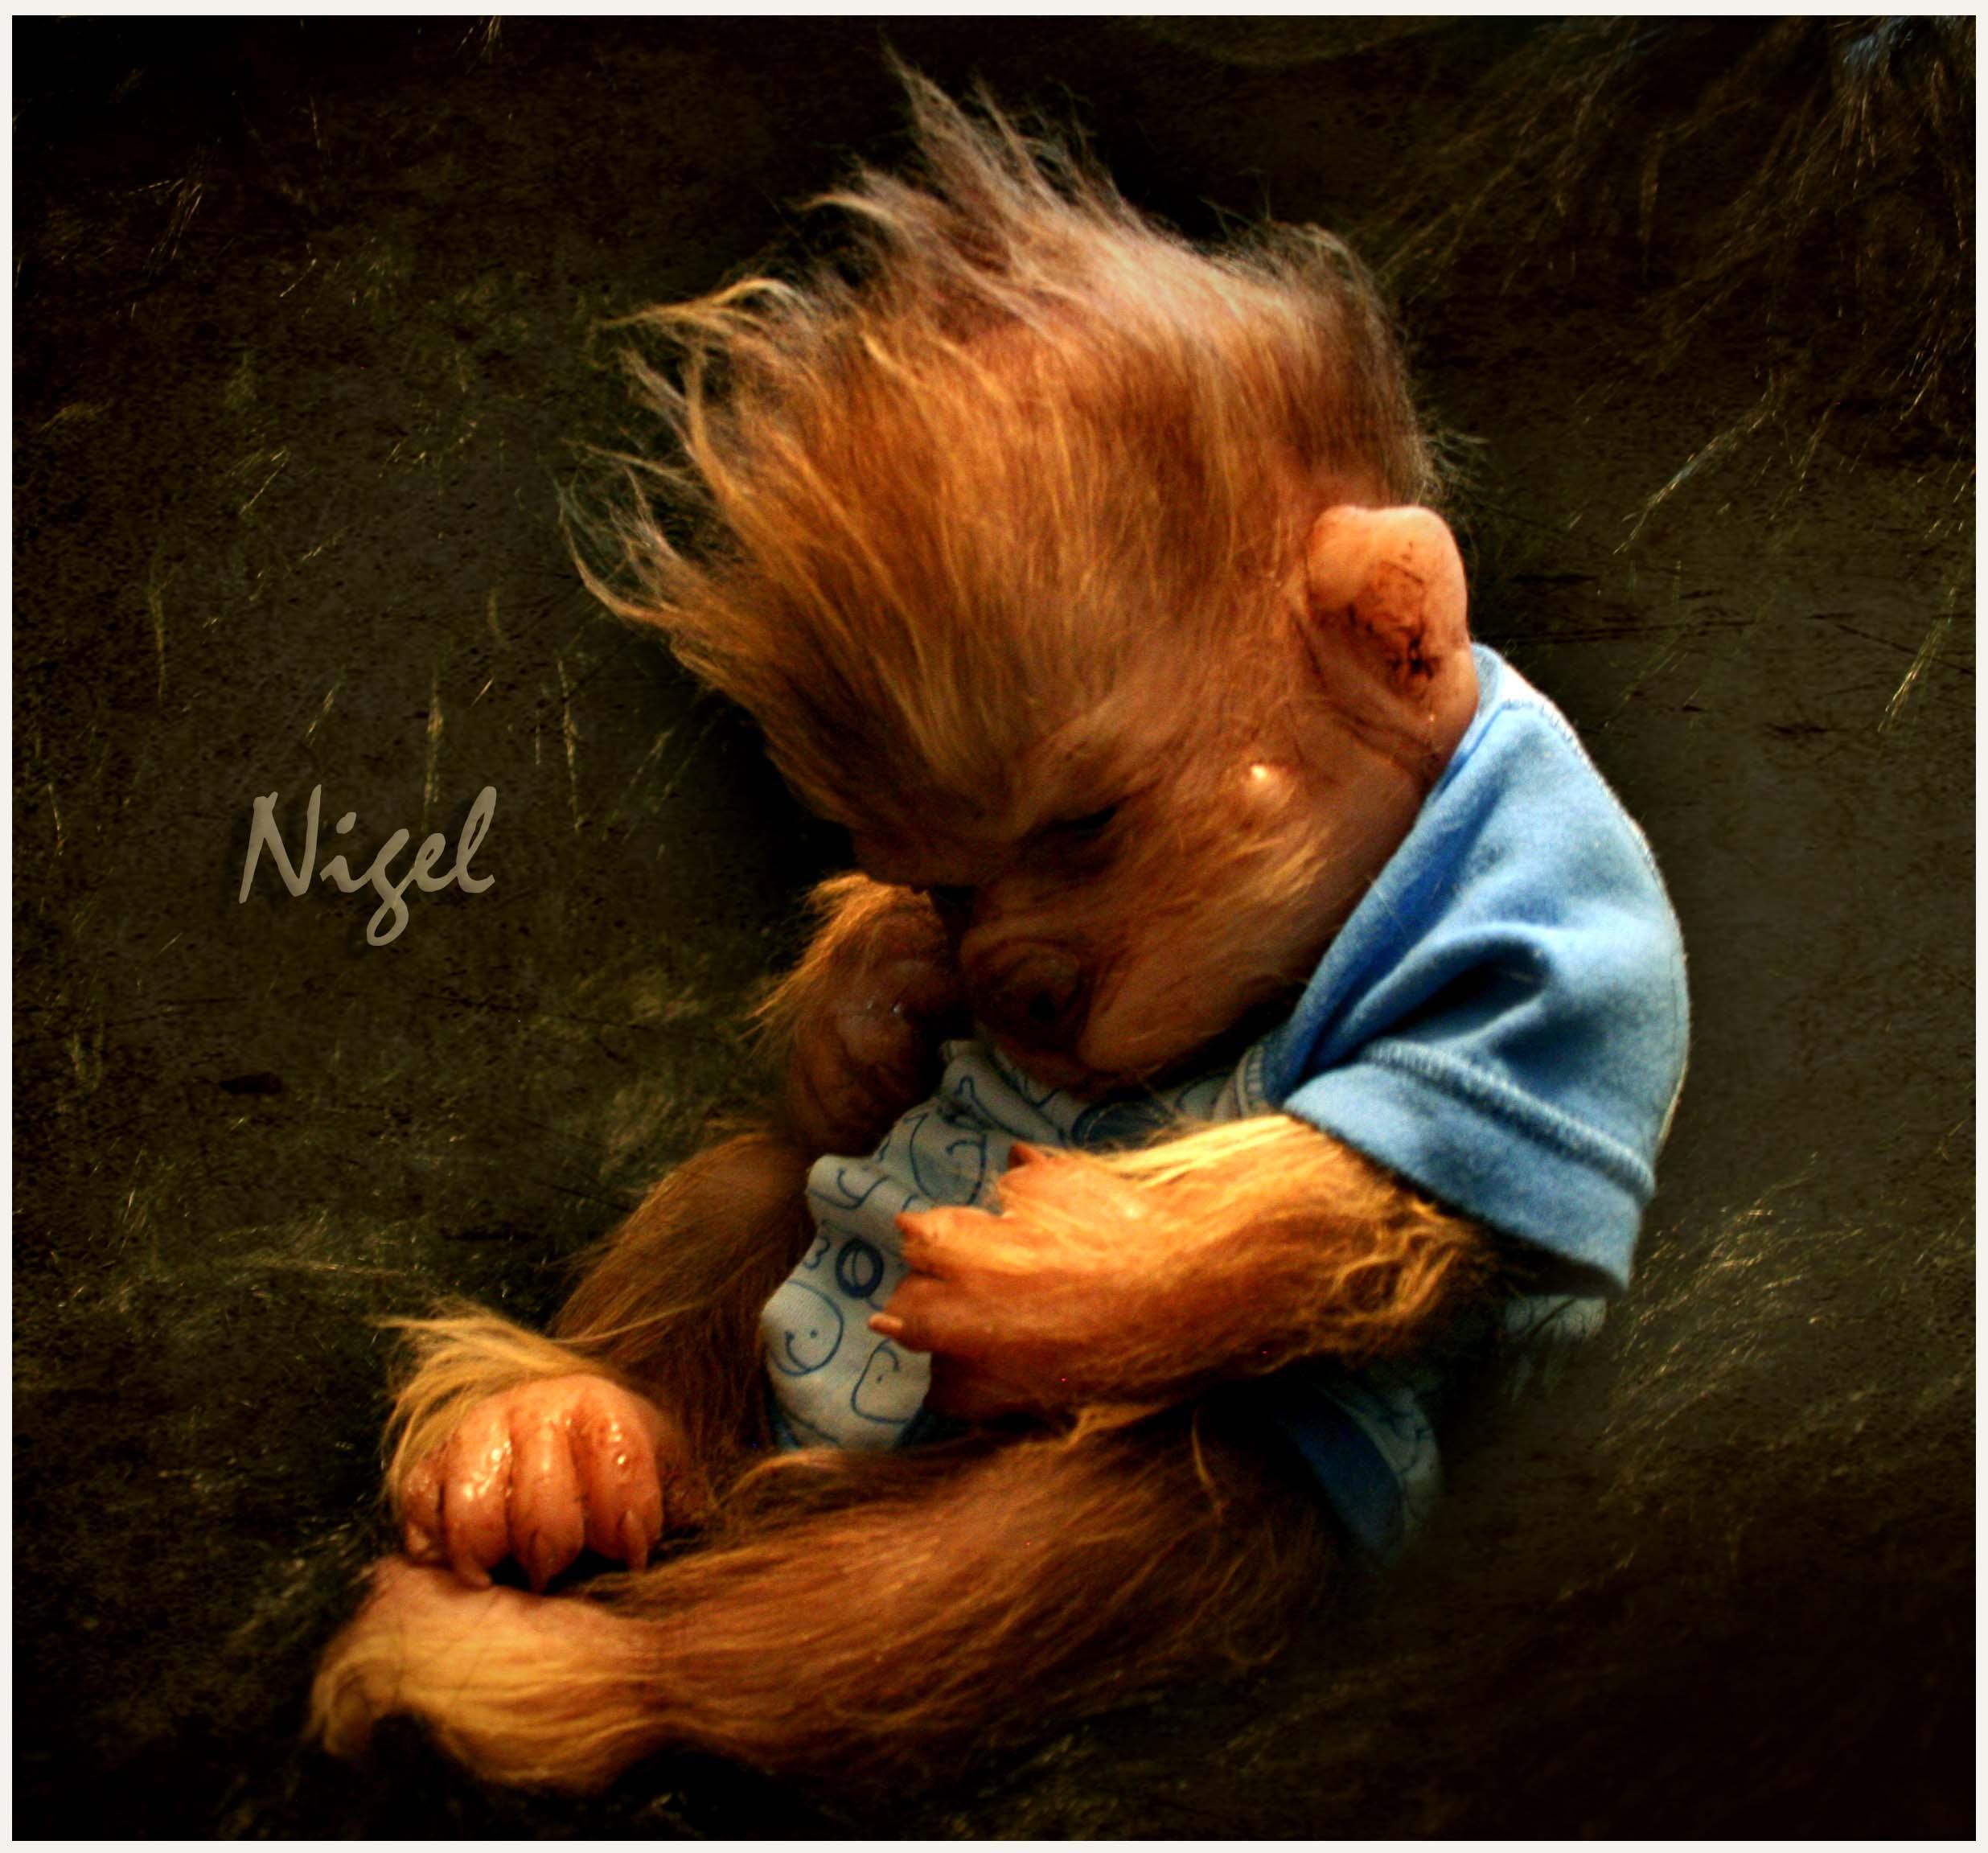 Nigel's wild hair